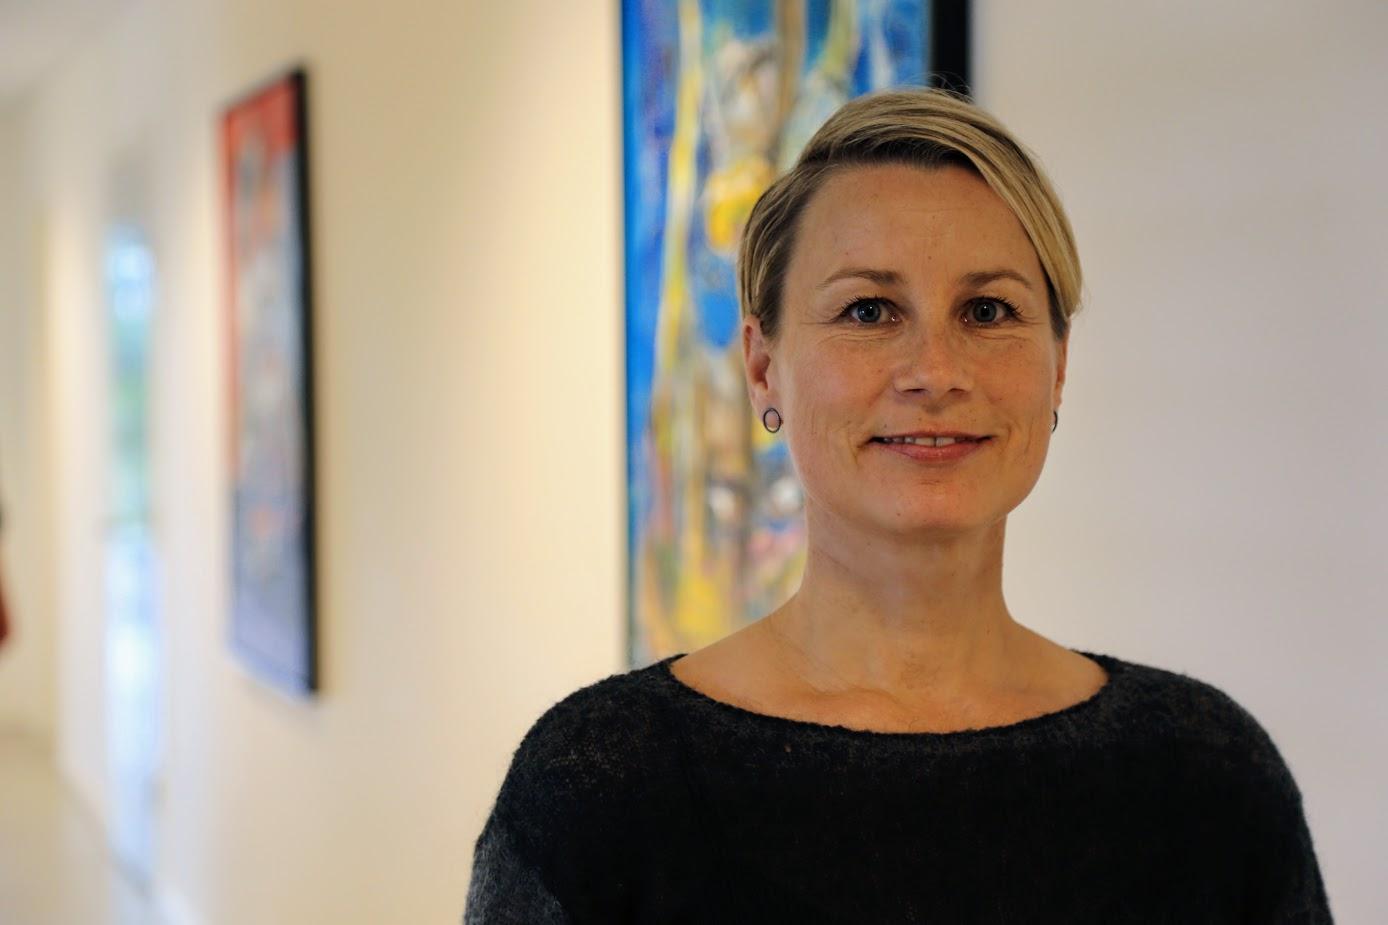 Carina Boval Andersen